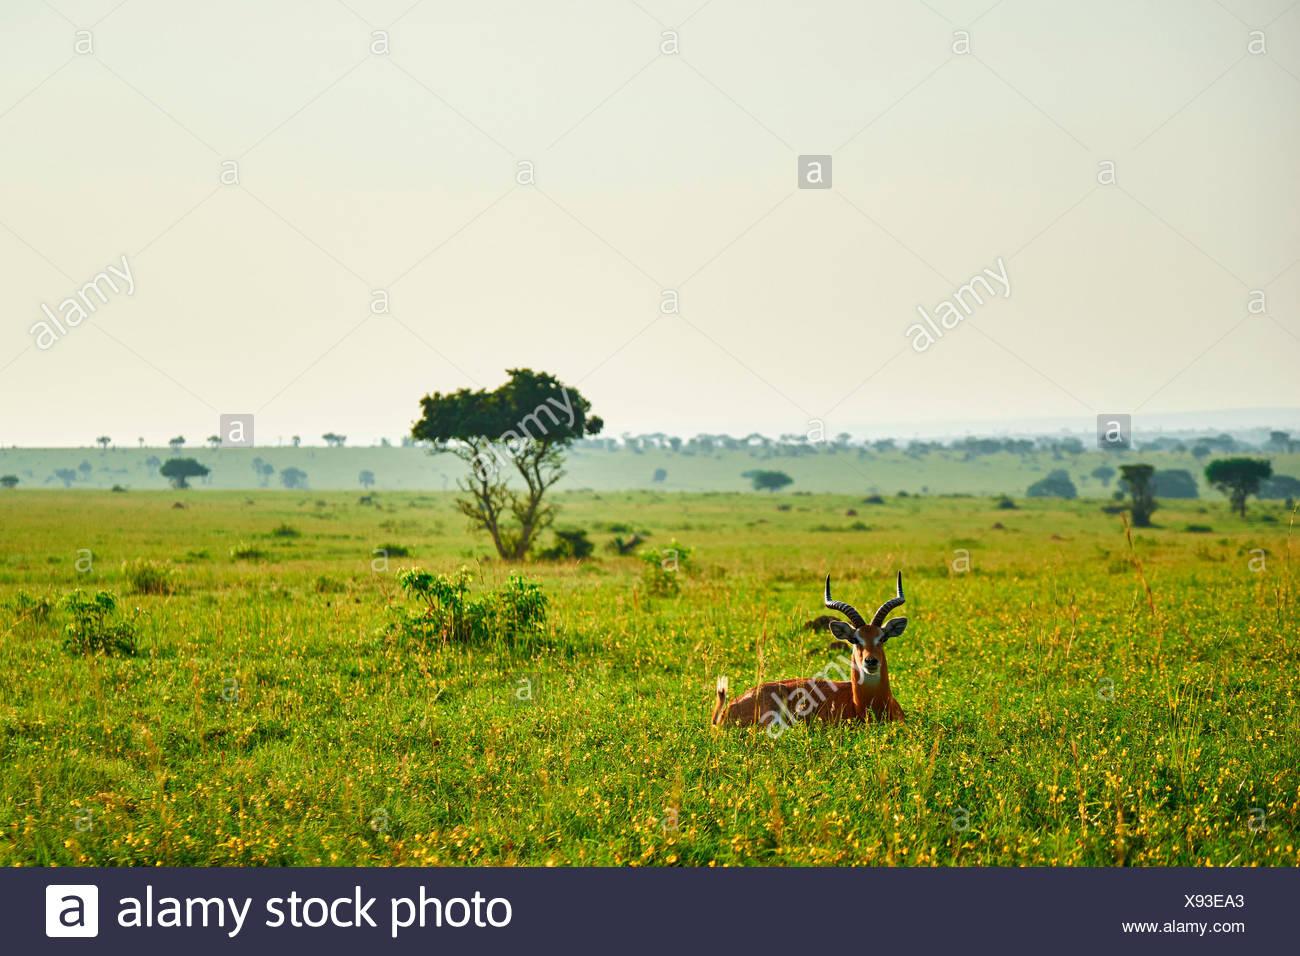 Paesaggio africano con gazelle, Queen Elizabeth National Park, Kasese, Rwenzururu sub-regione, Uganda occidentale, Uganda, Africa Immagini Stock